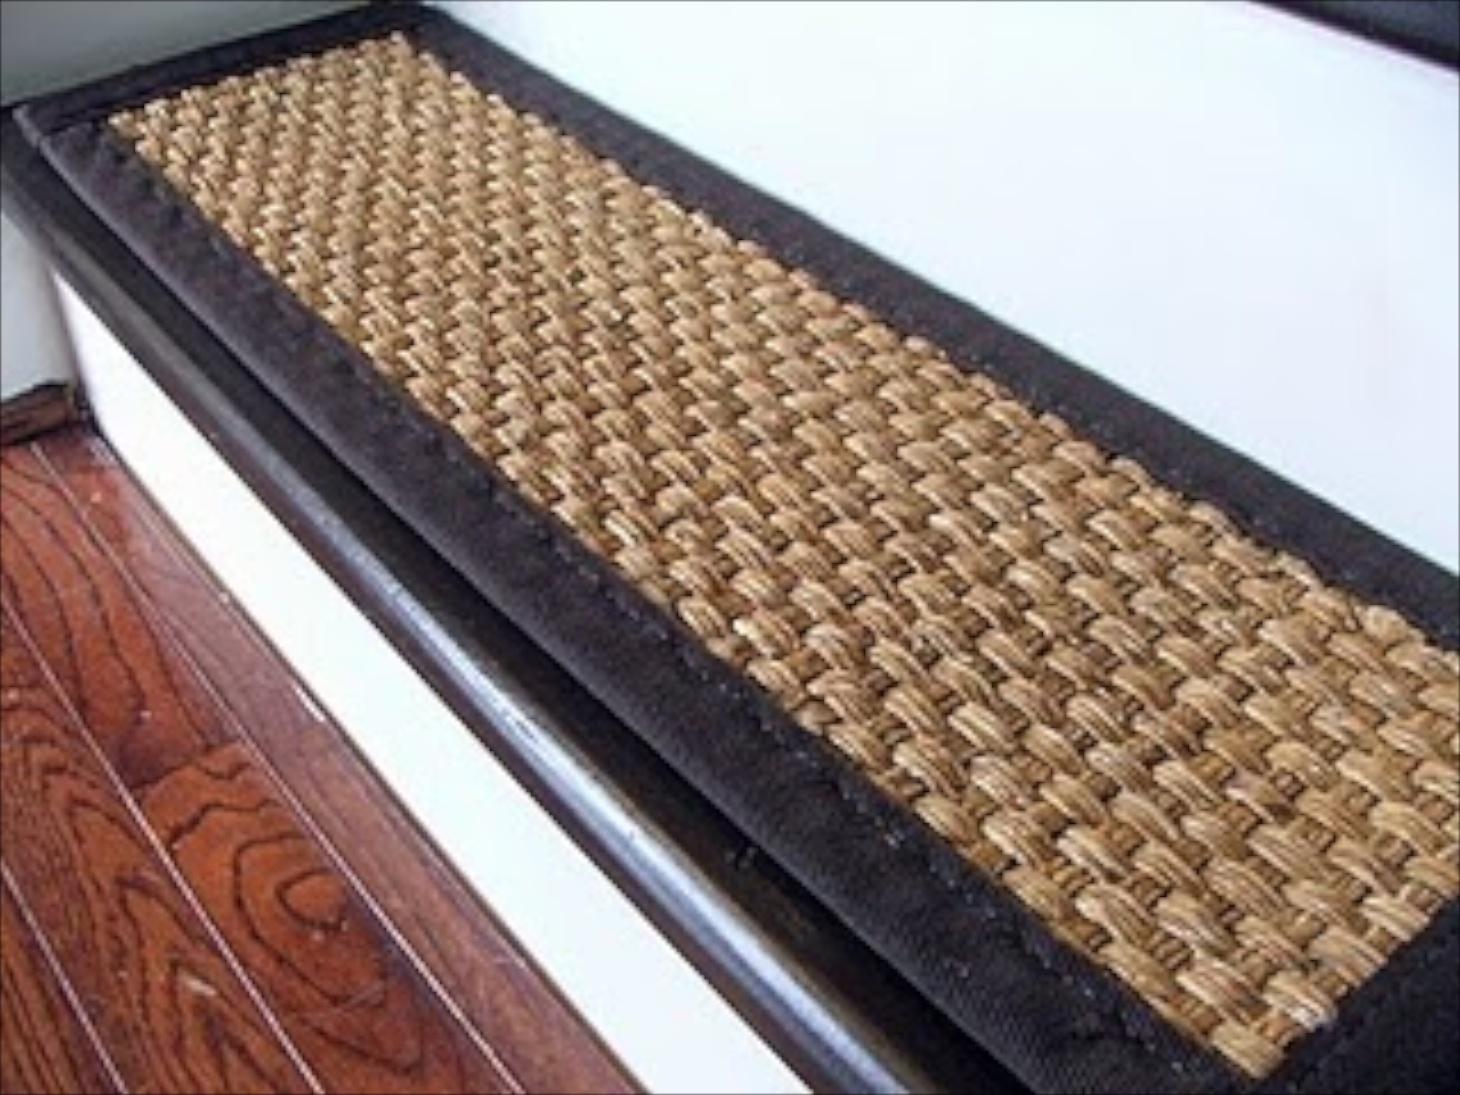 Flooring Stair Treads Carpet Carpet Tread Carpet Treads For Throughout Stair Tread Carpet Covers (#9 of 20)